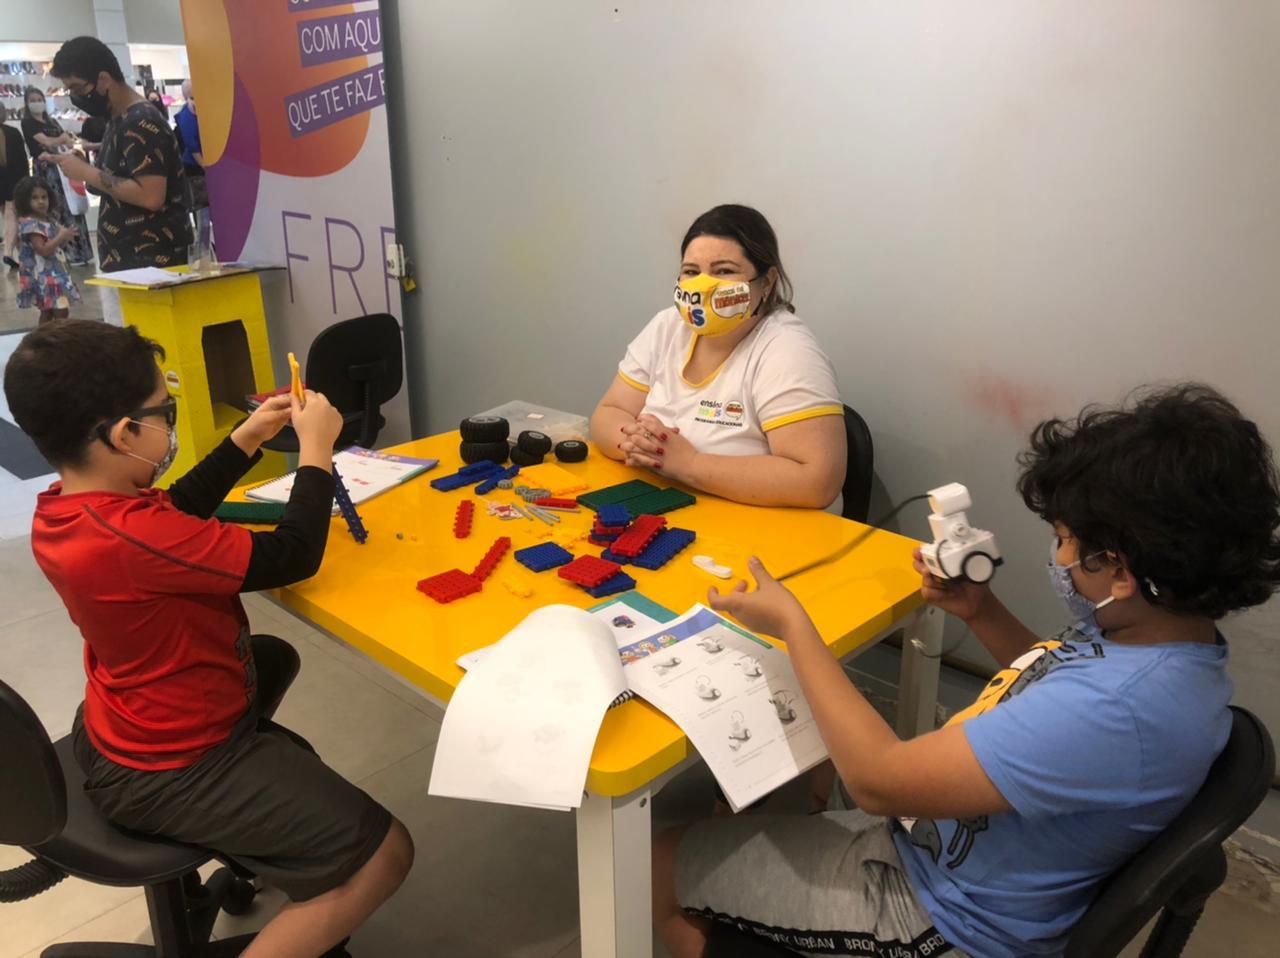 Shopping Parque Balneário Promove Workshop De Robótica Educacional